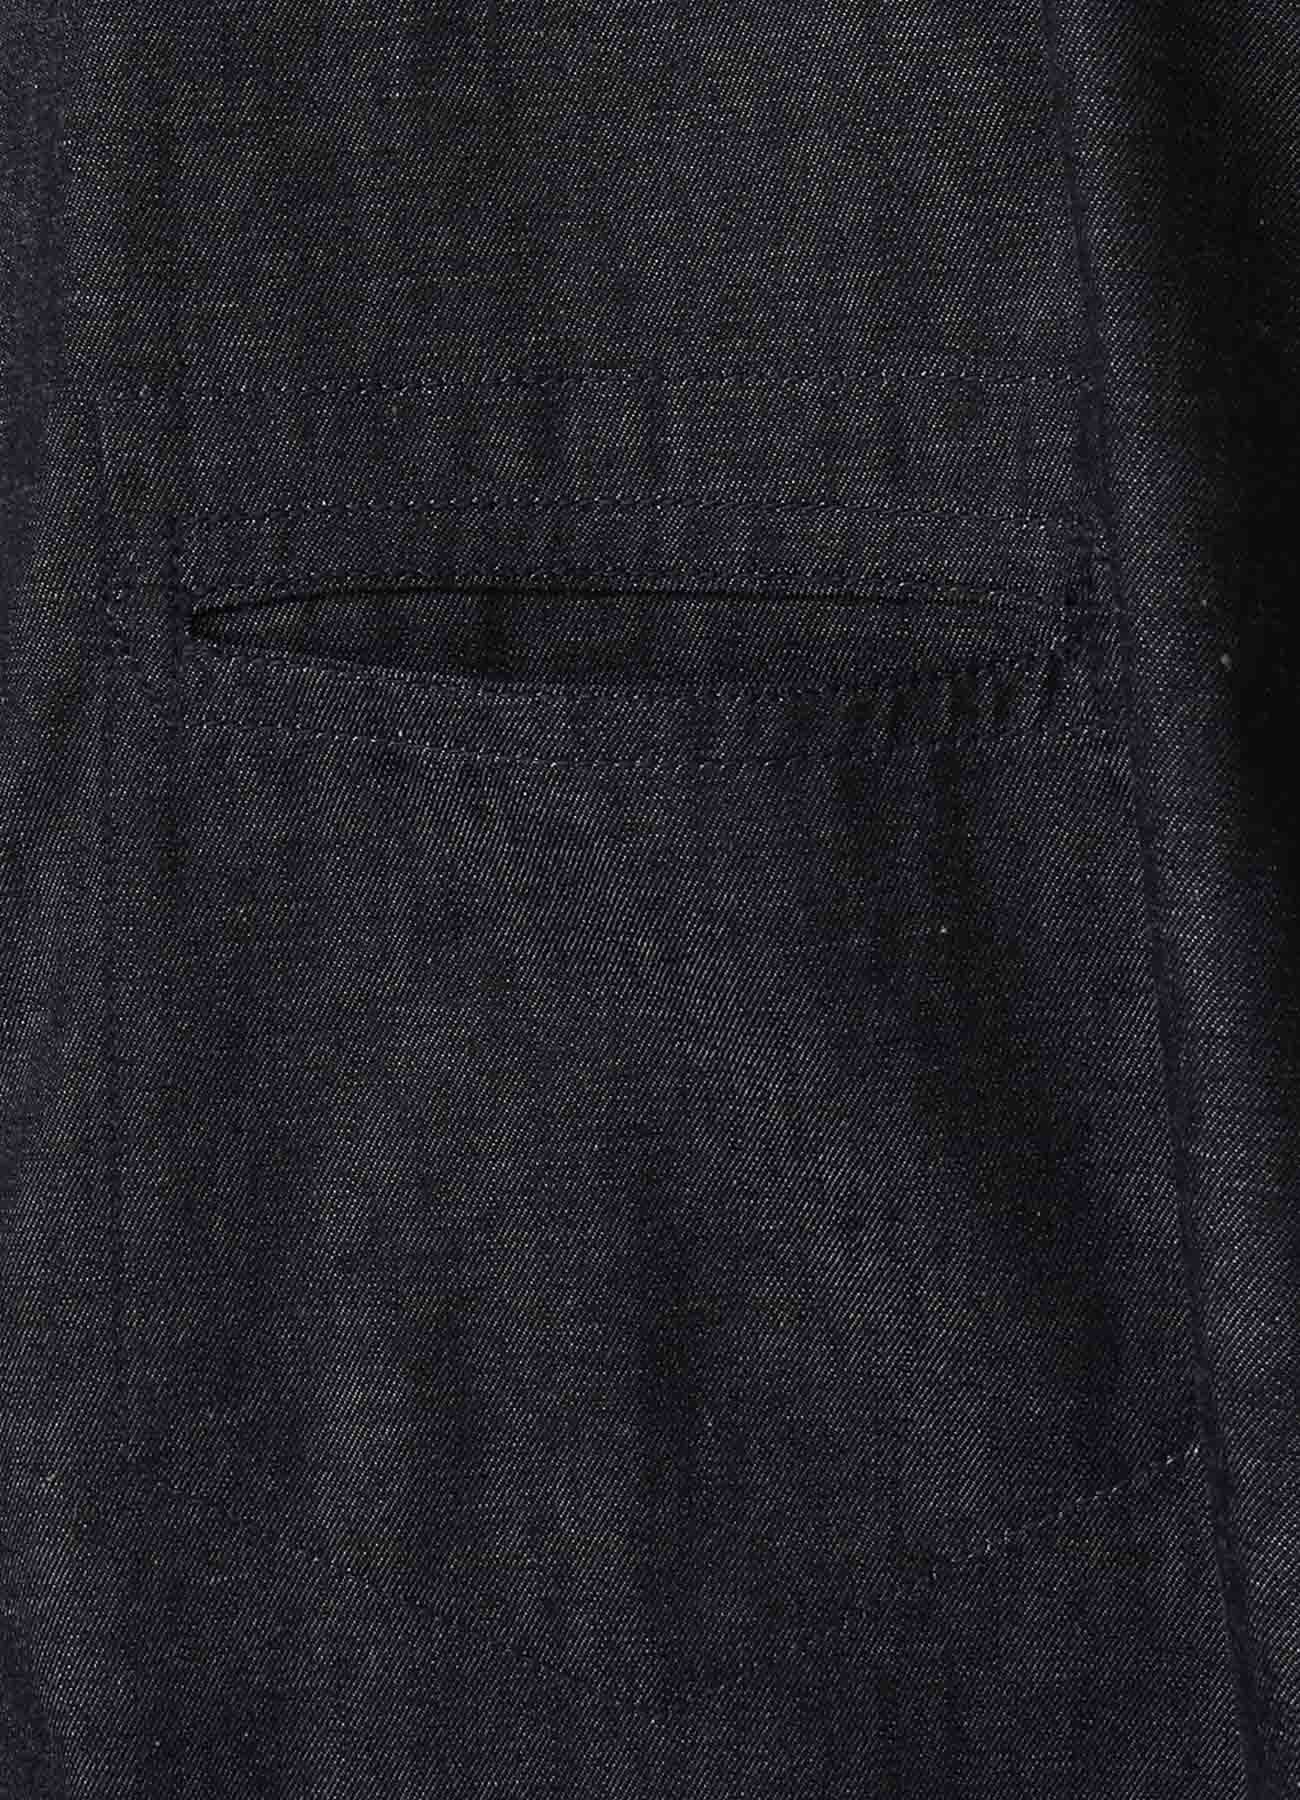 6oz Denim Dolman Short Sleeves Big Shirt